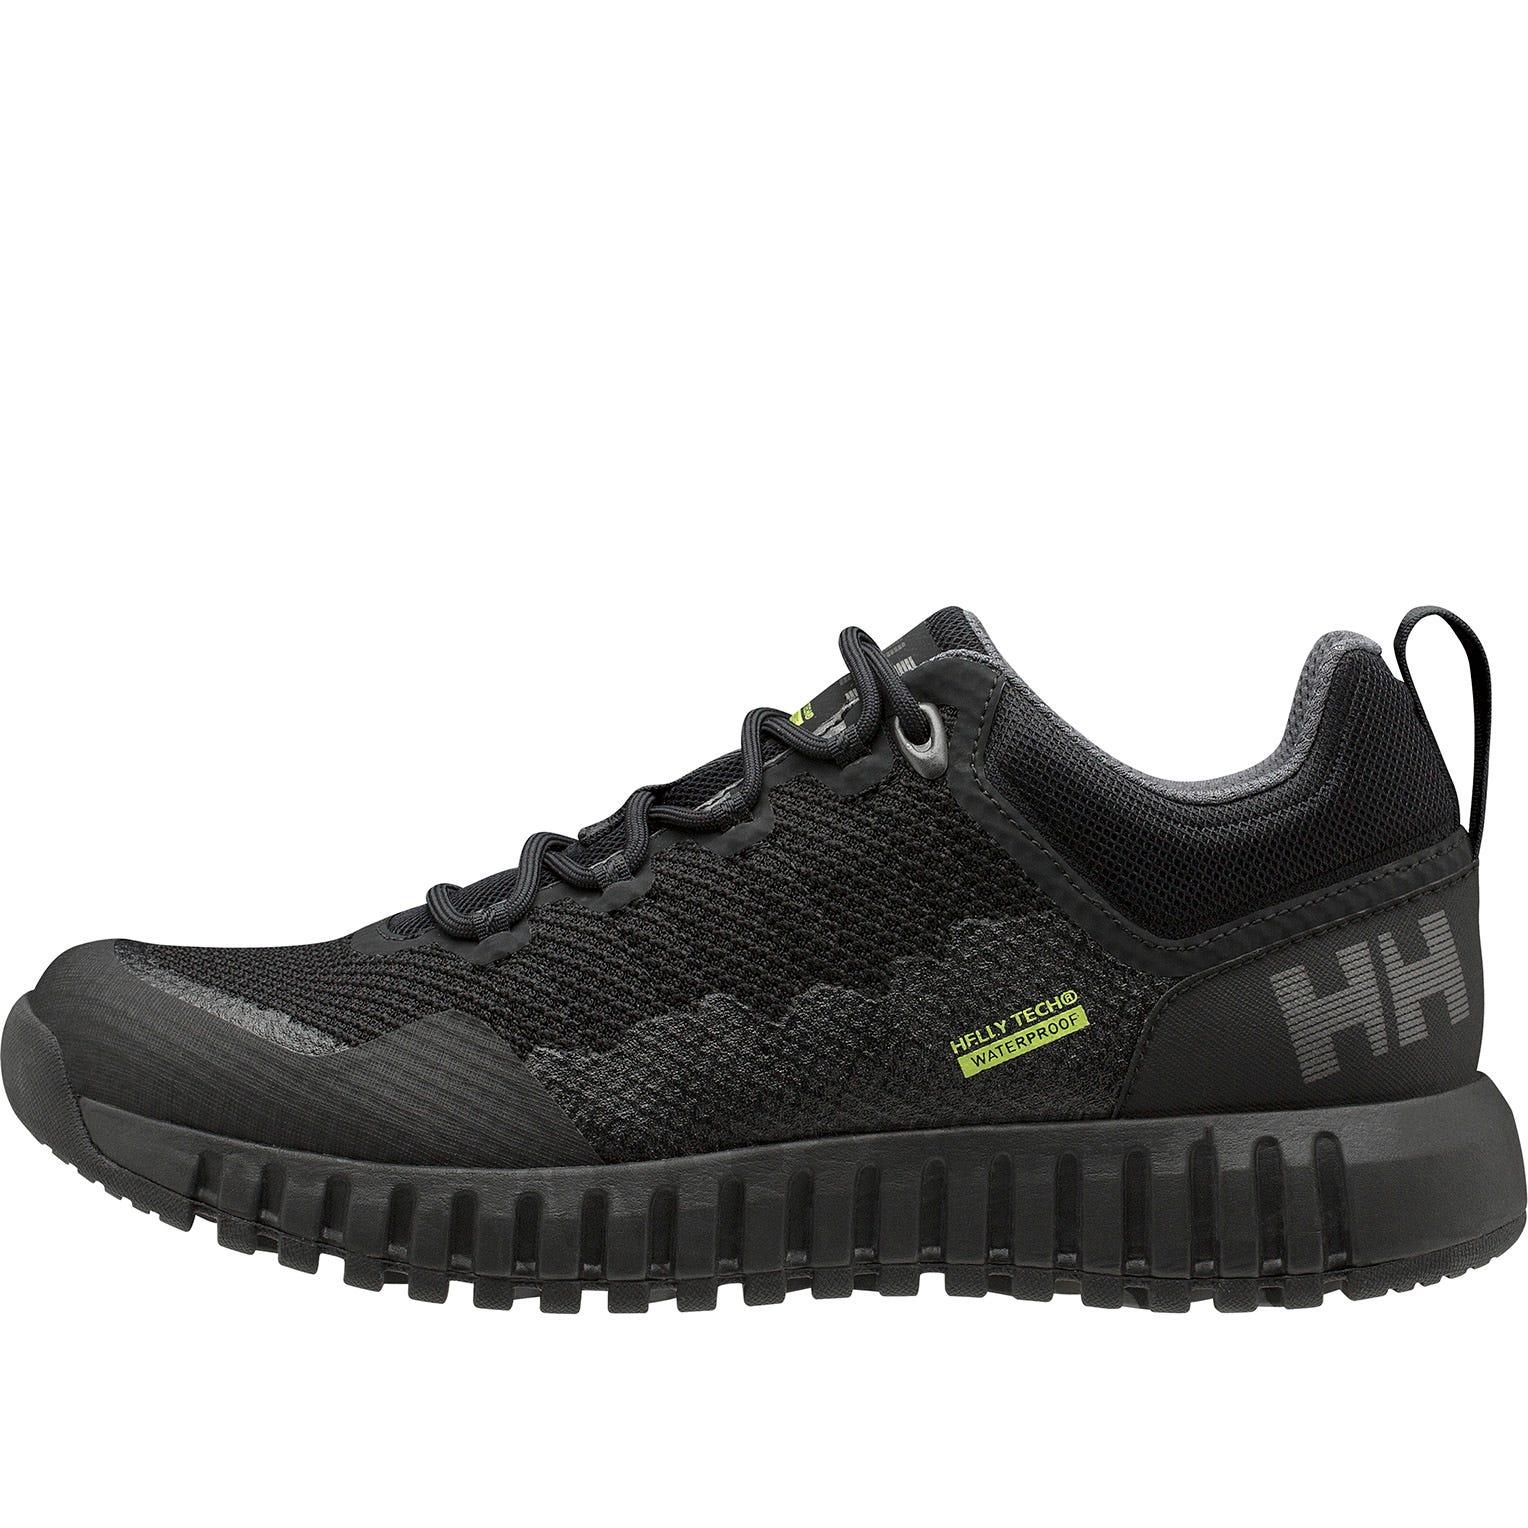 Helly Hansen Vanir Hegira Ht Mens Hiking Boot Black 40.5/7.5